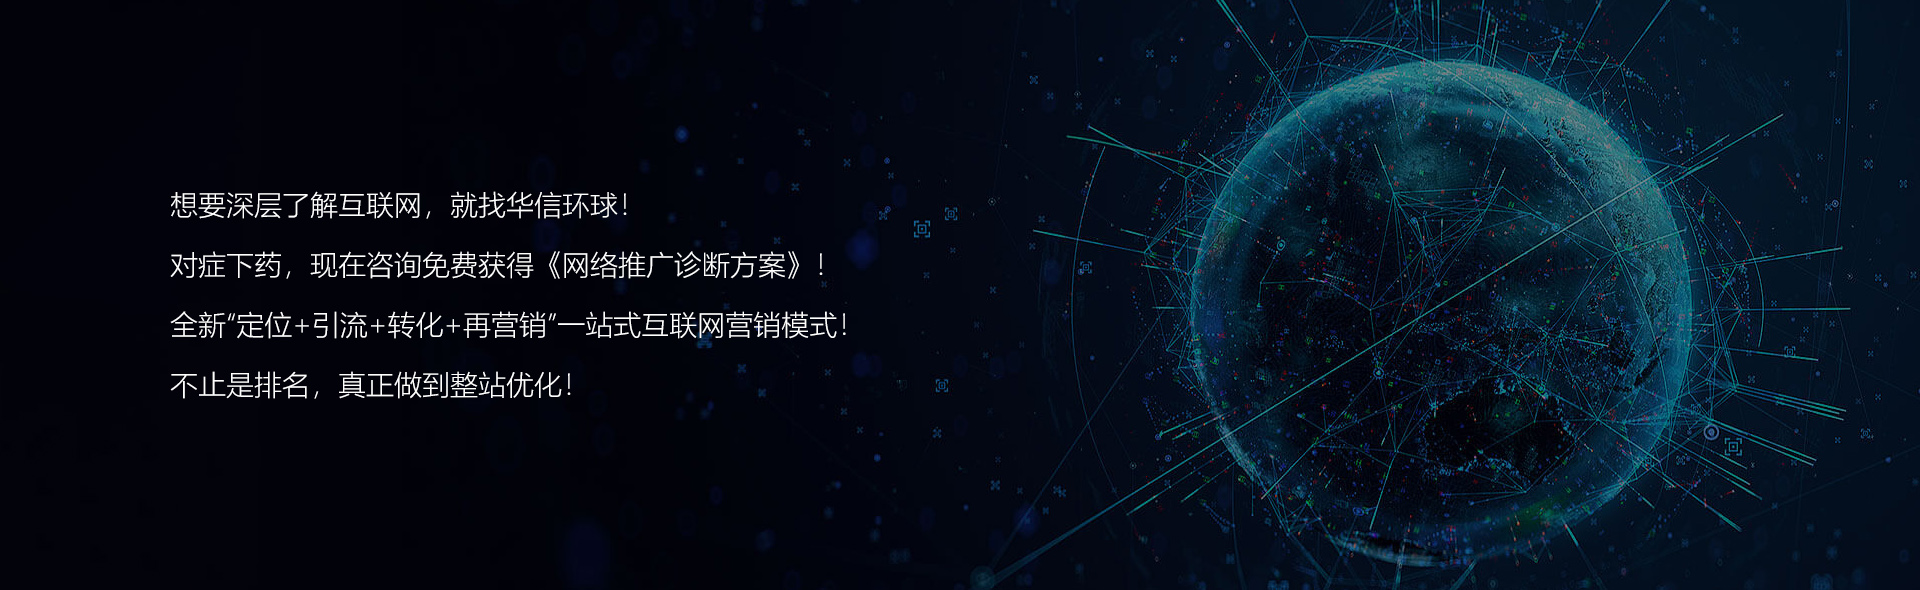 企业团队活动与环境banner